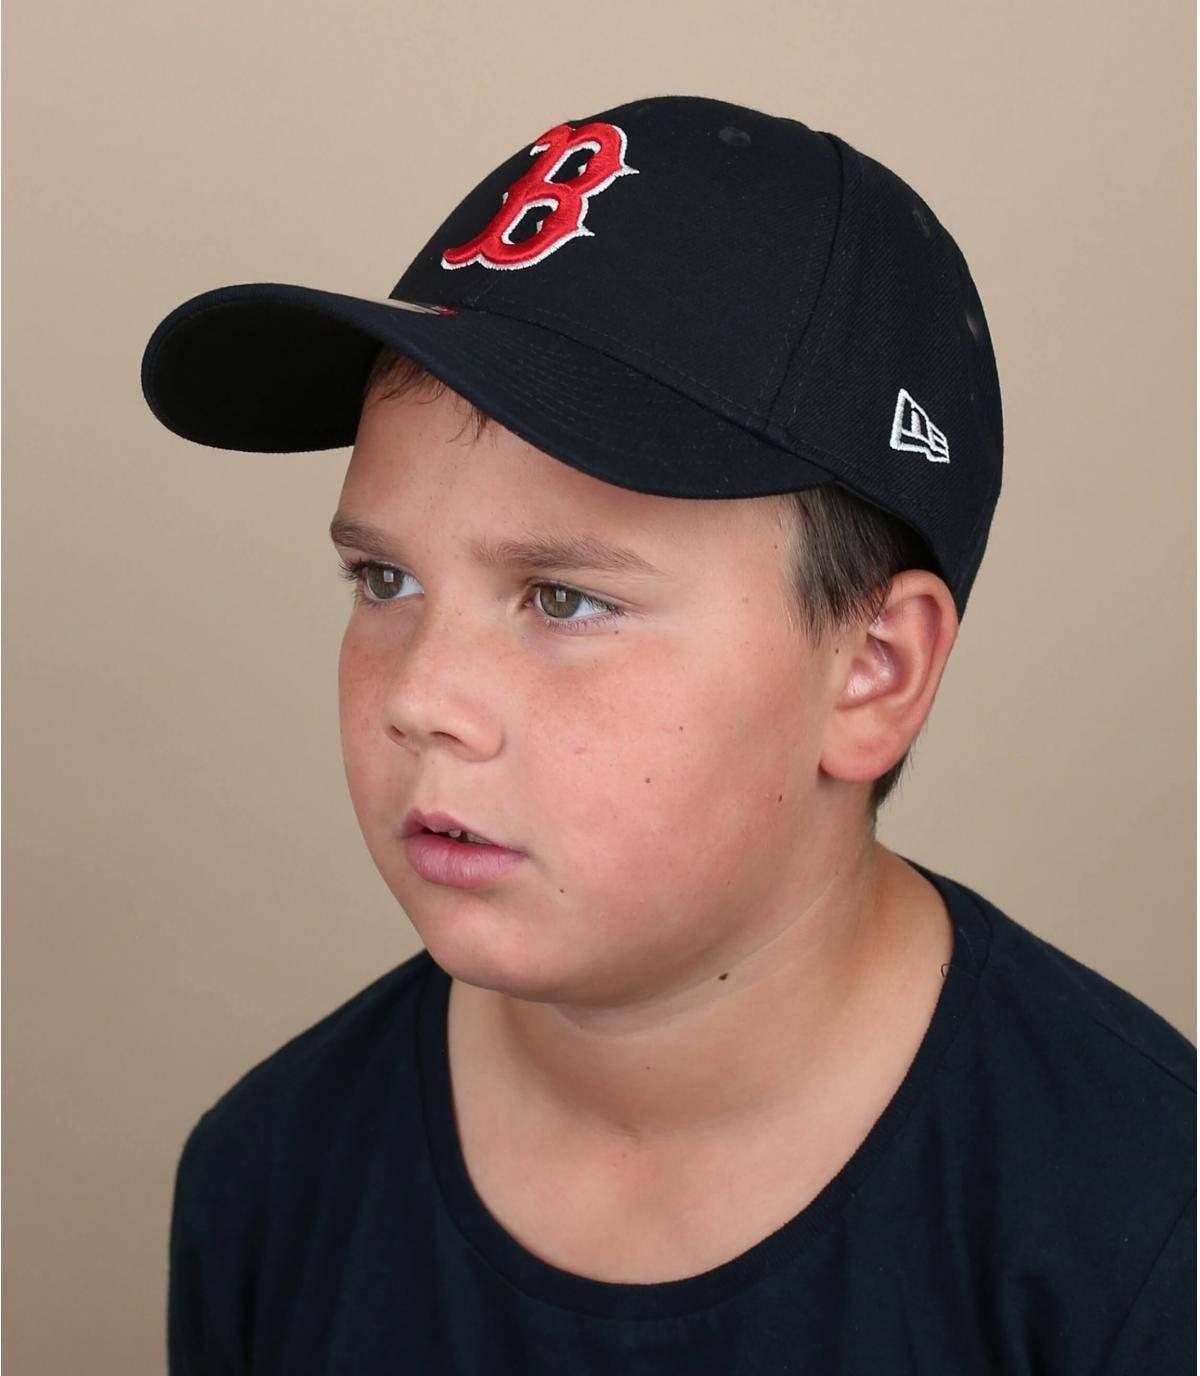 cappellino B bambino